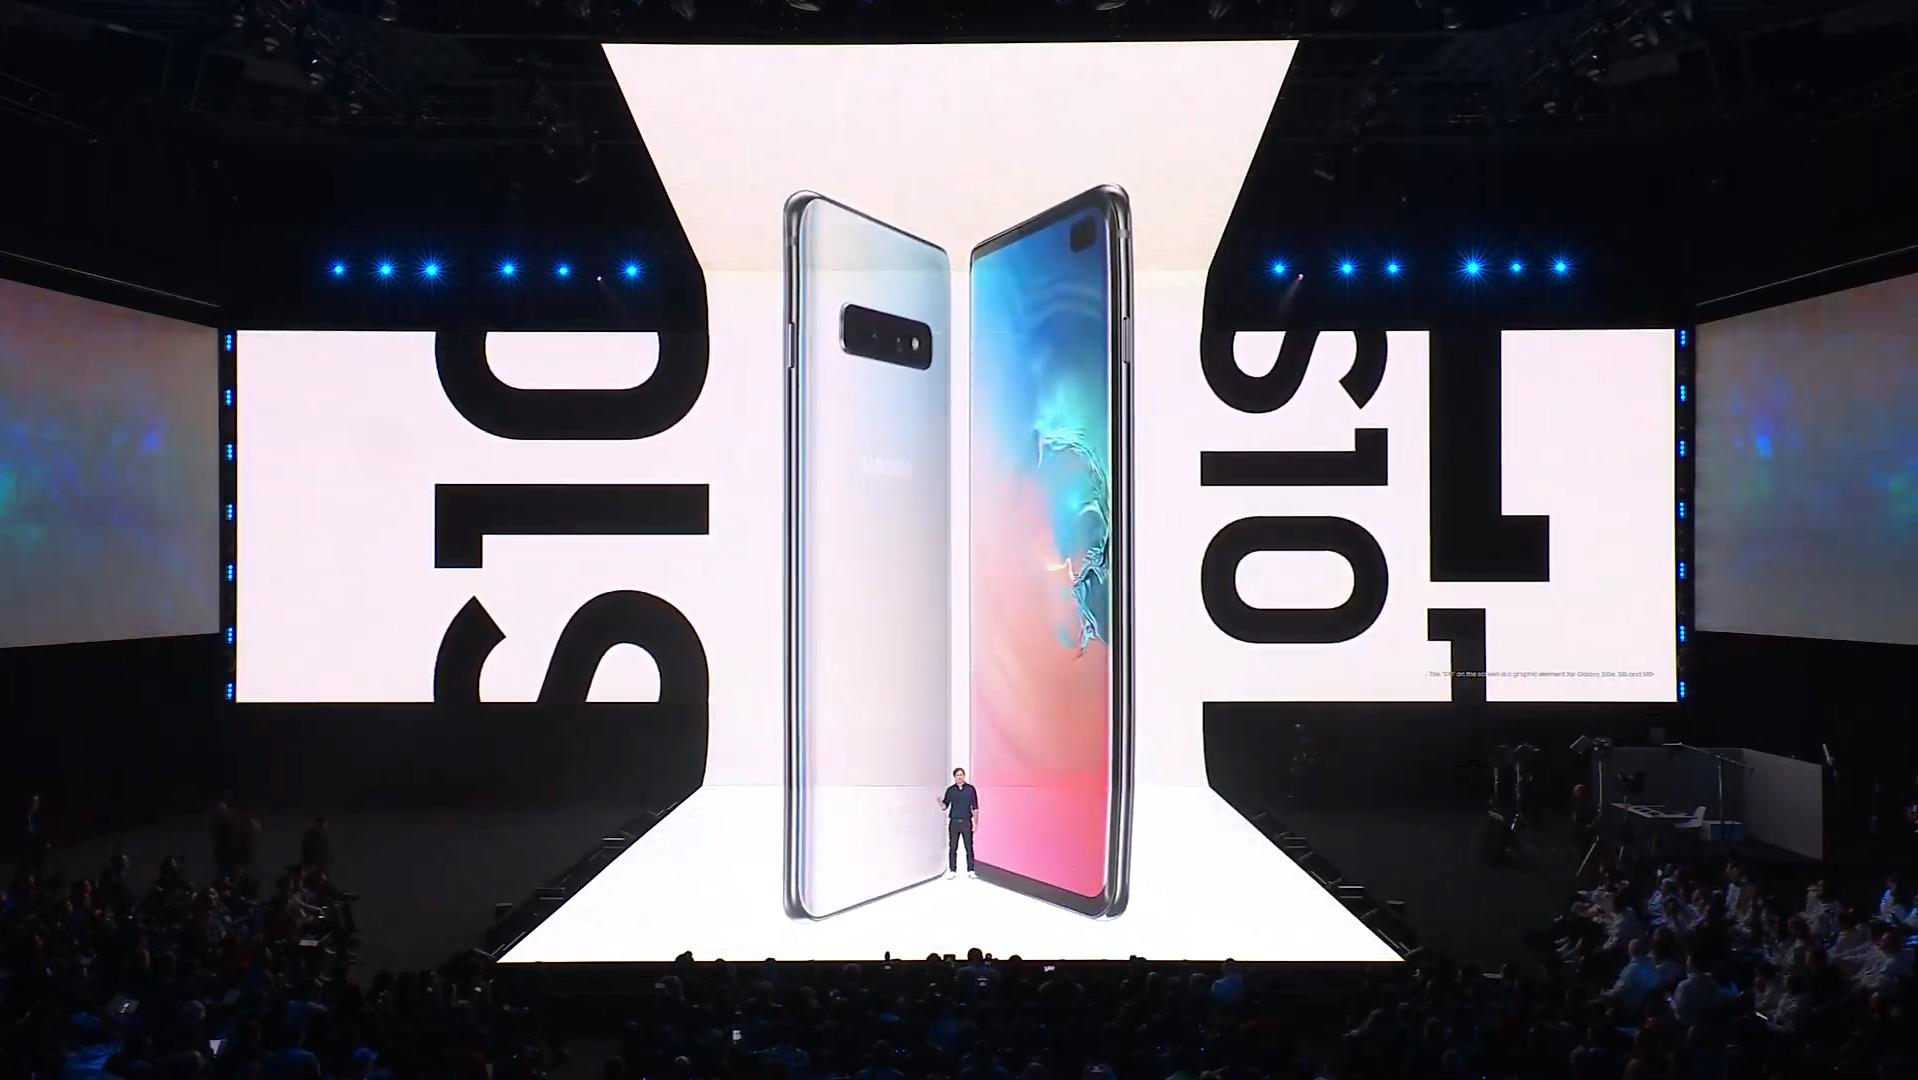 Présentation des Samsung Galaxy S10 : trop de smartphones tuent le smartphone ?